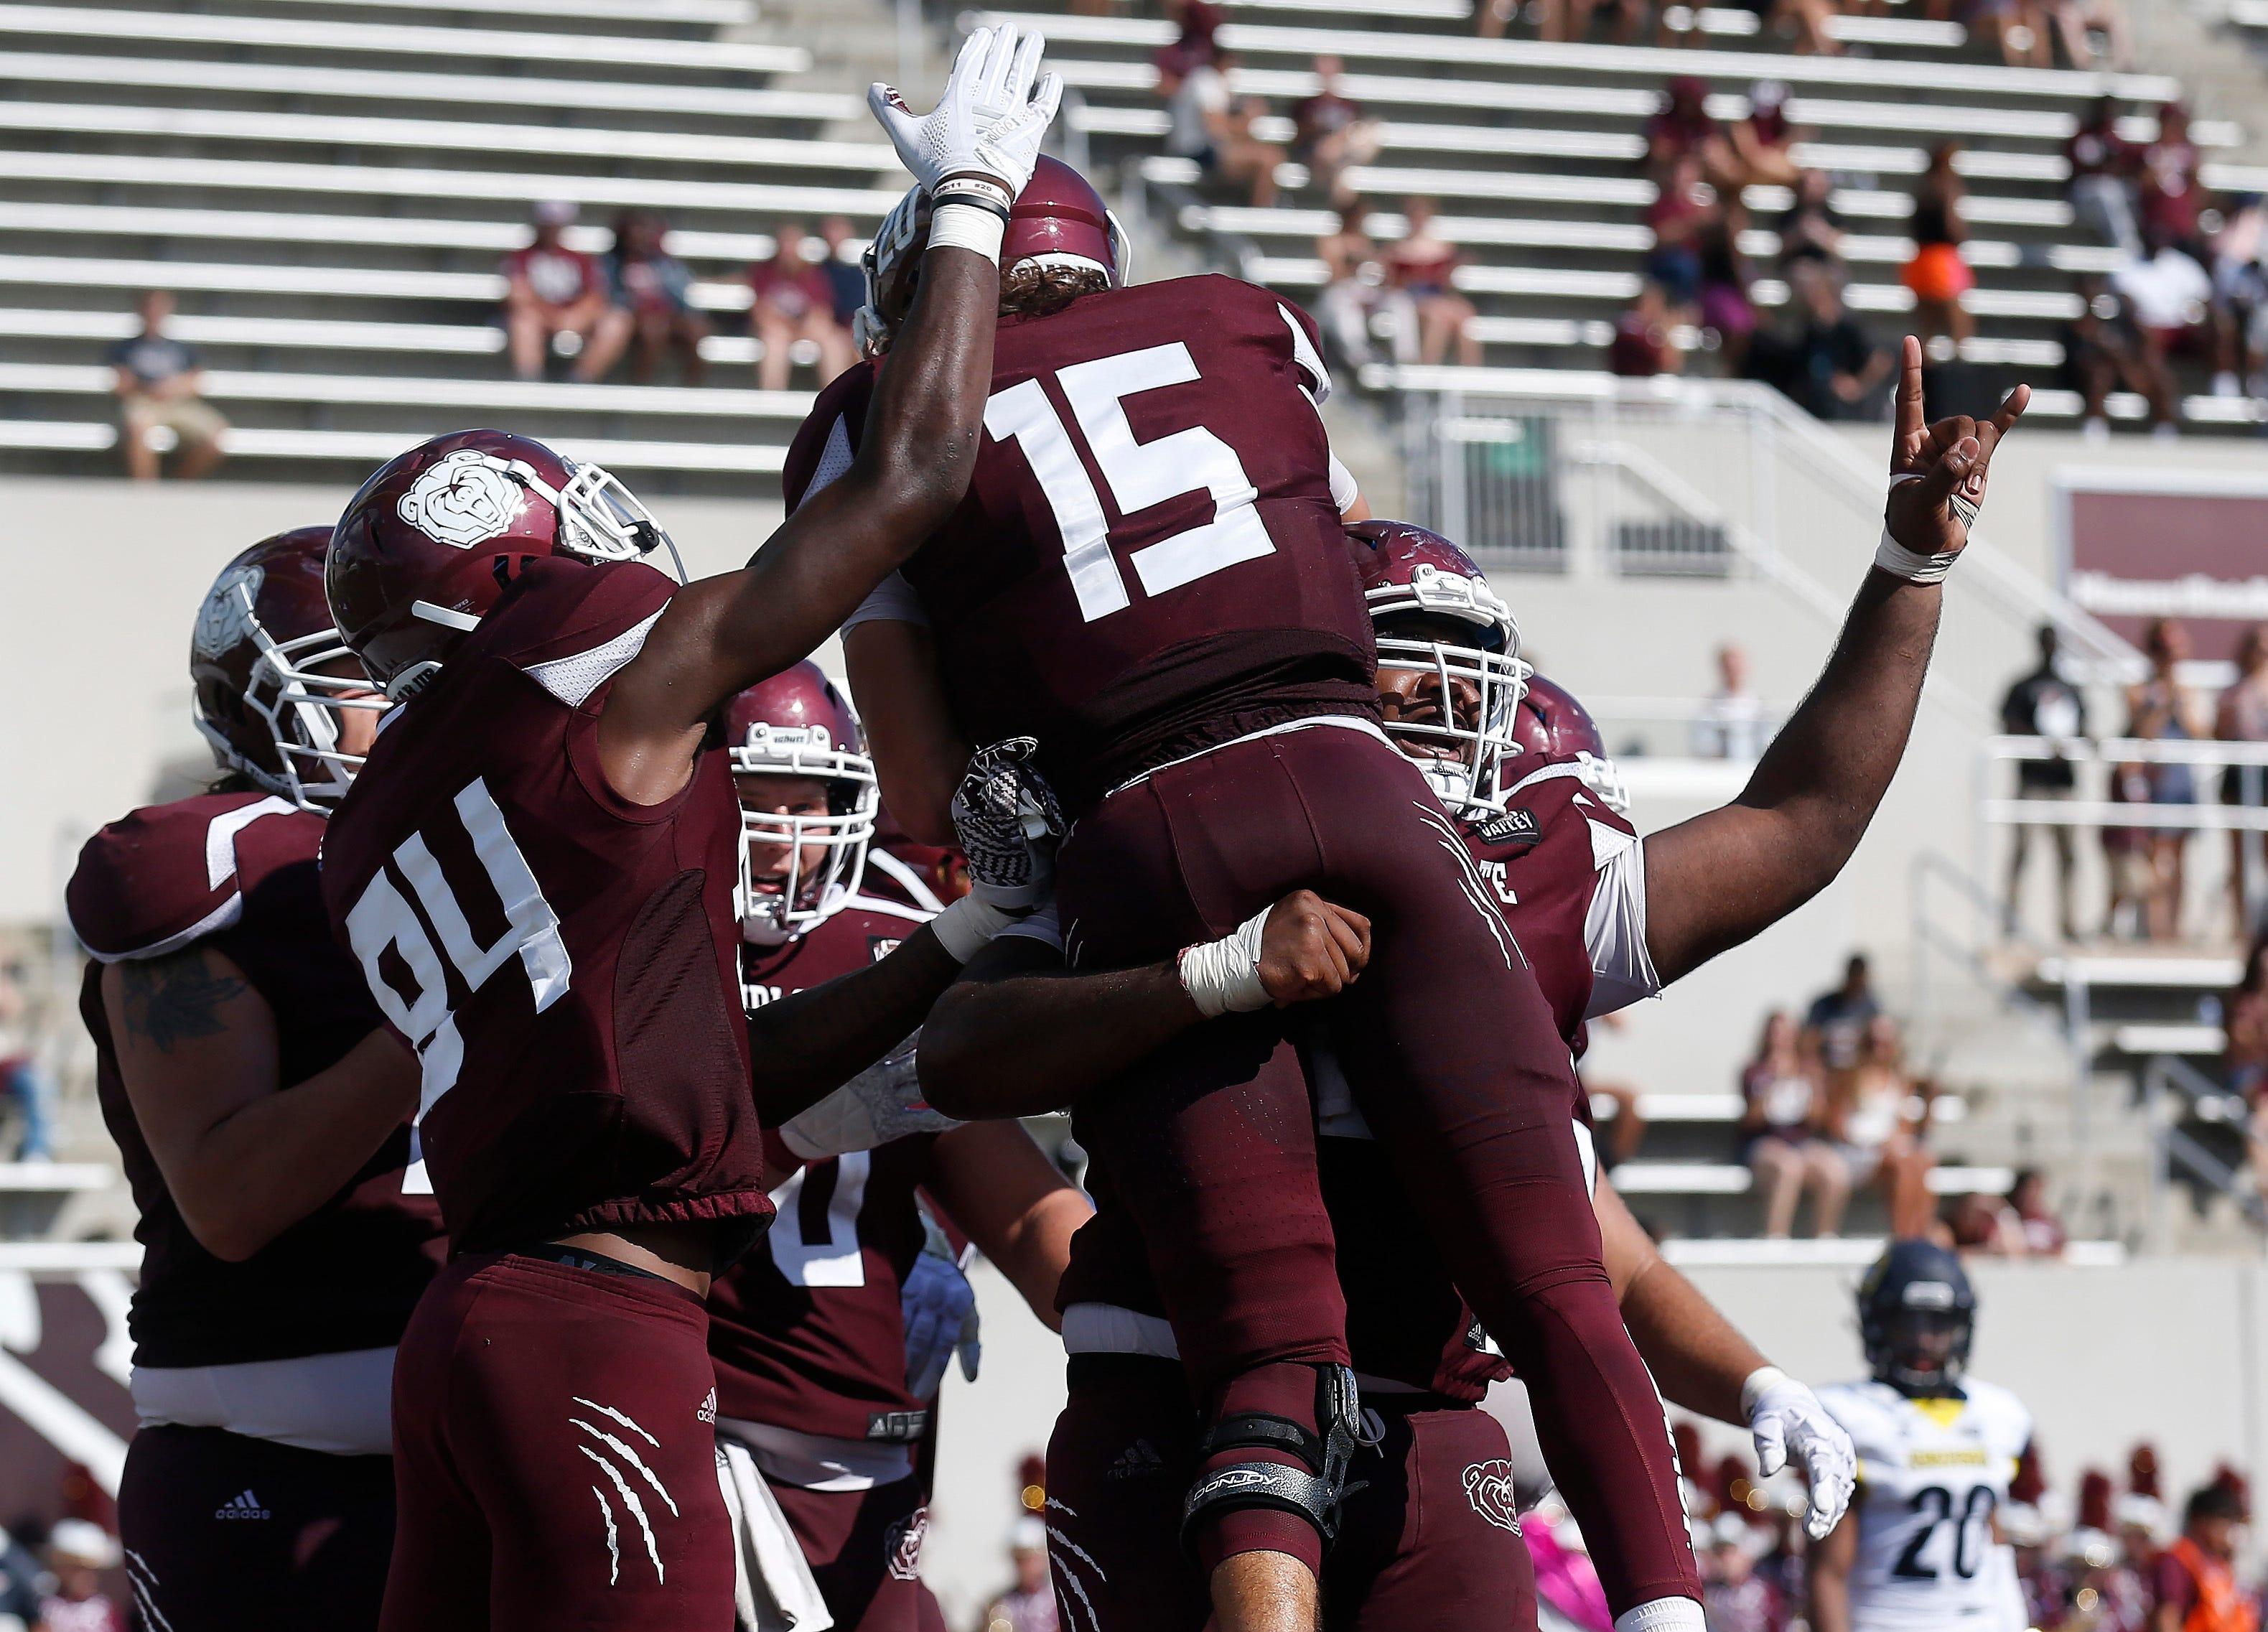 Missouri State University defeated Northern Arizona 40-8 at Plaster Stadium on Saturday, Sept. 15, 2018.